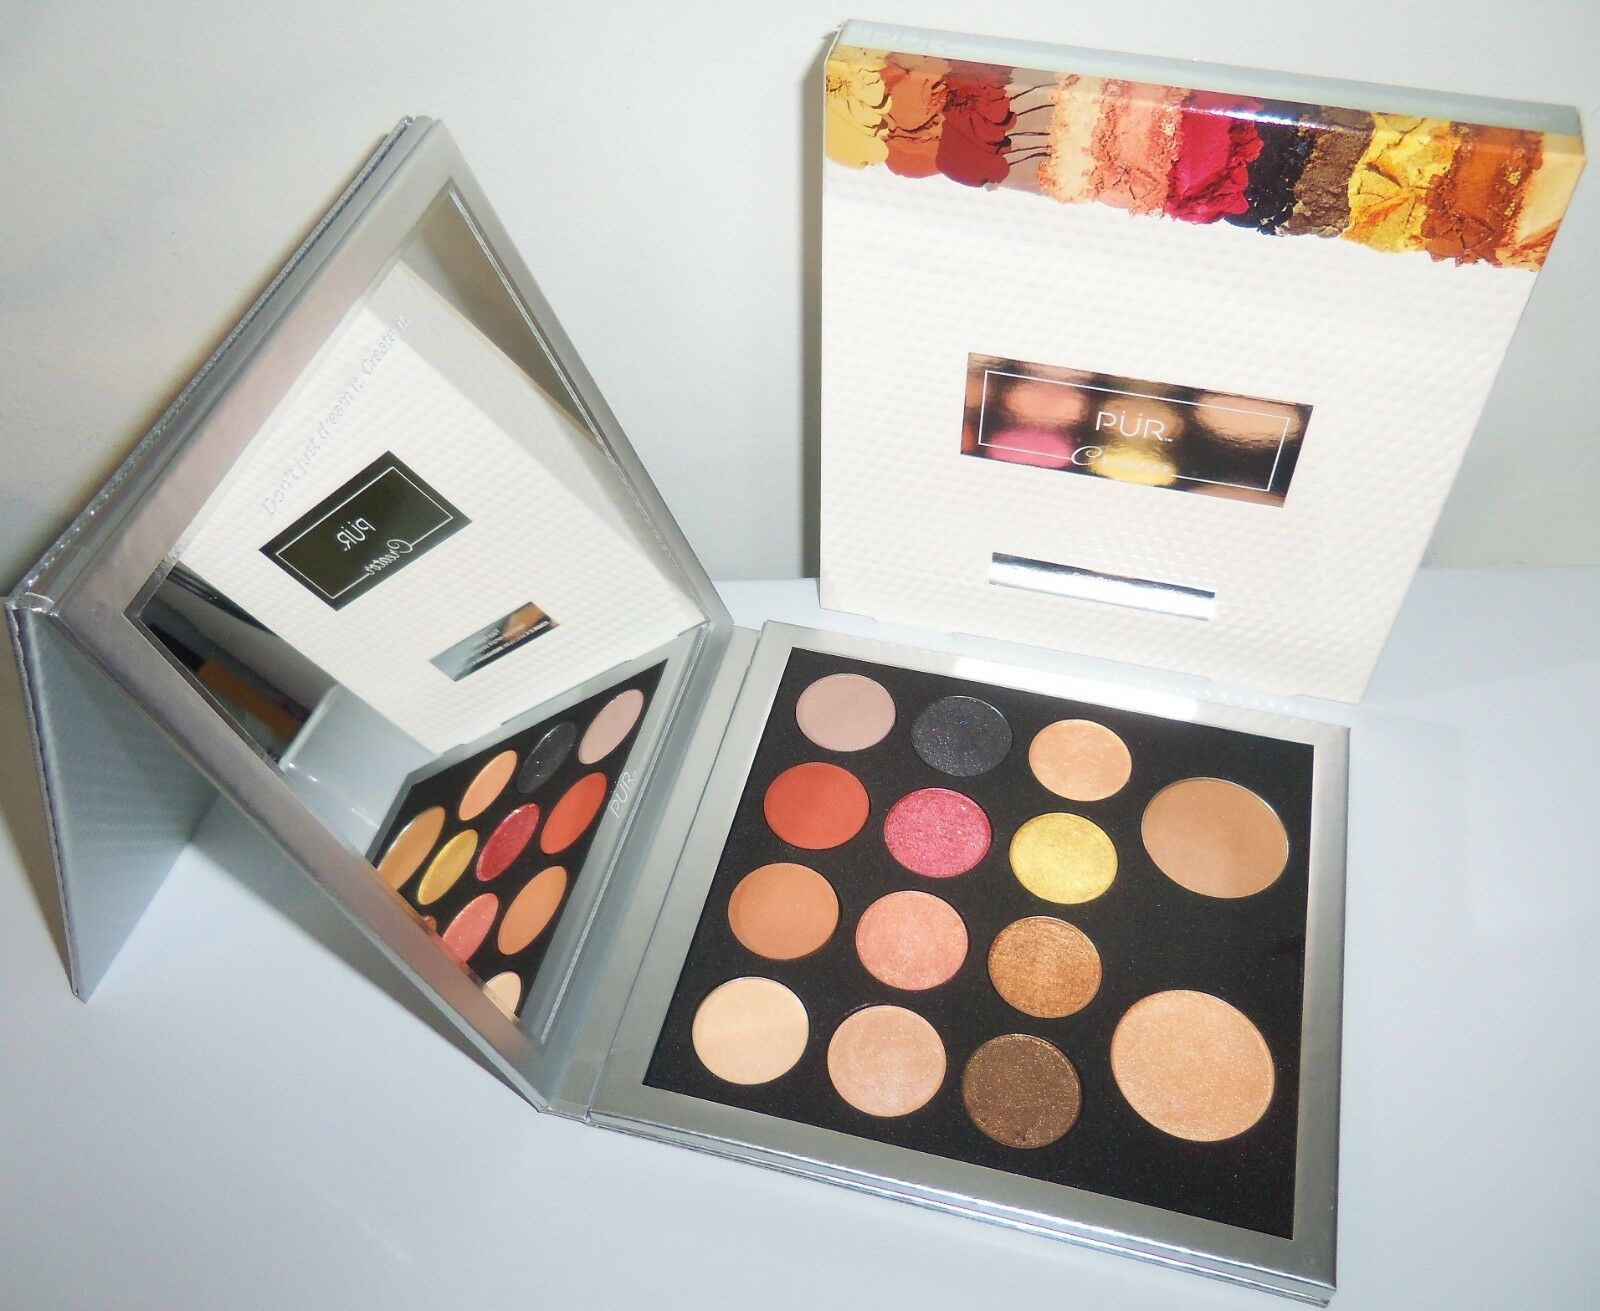 PUR Creator Face Palette - Z Palette - Standing Mirror/ BRAN